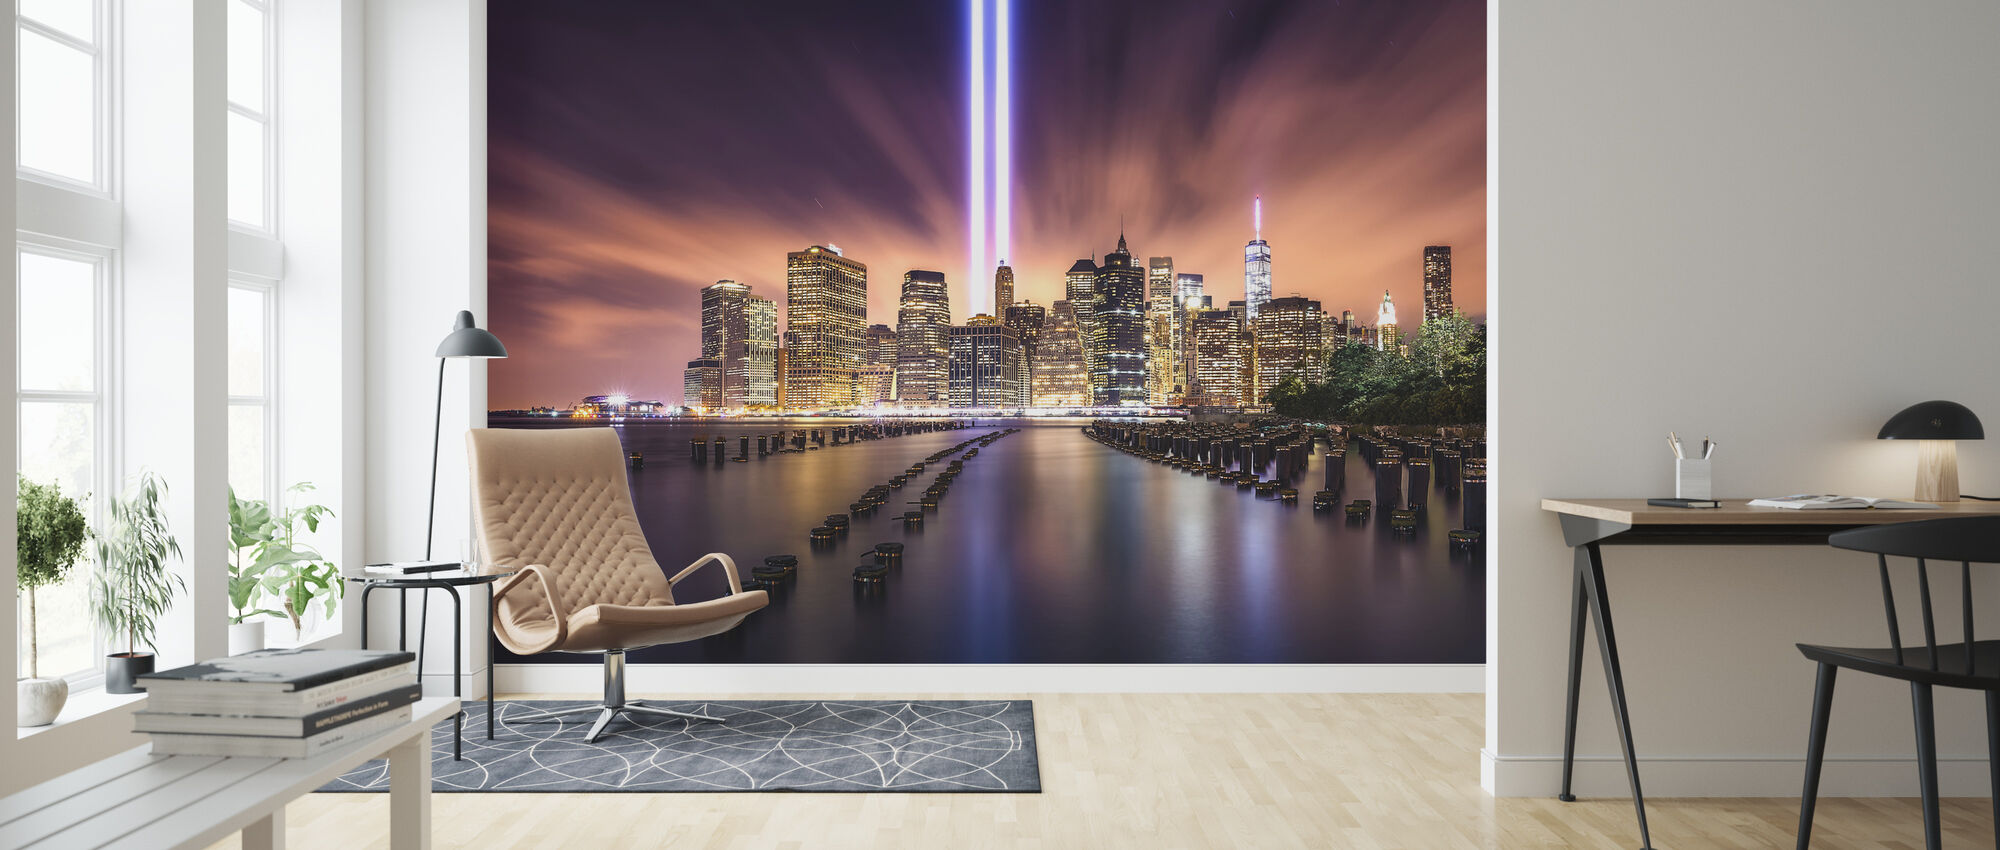 Unforgettable 9-11 - Wallpaper - Living Room